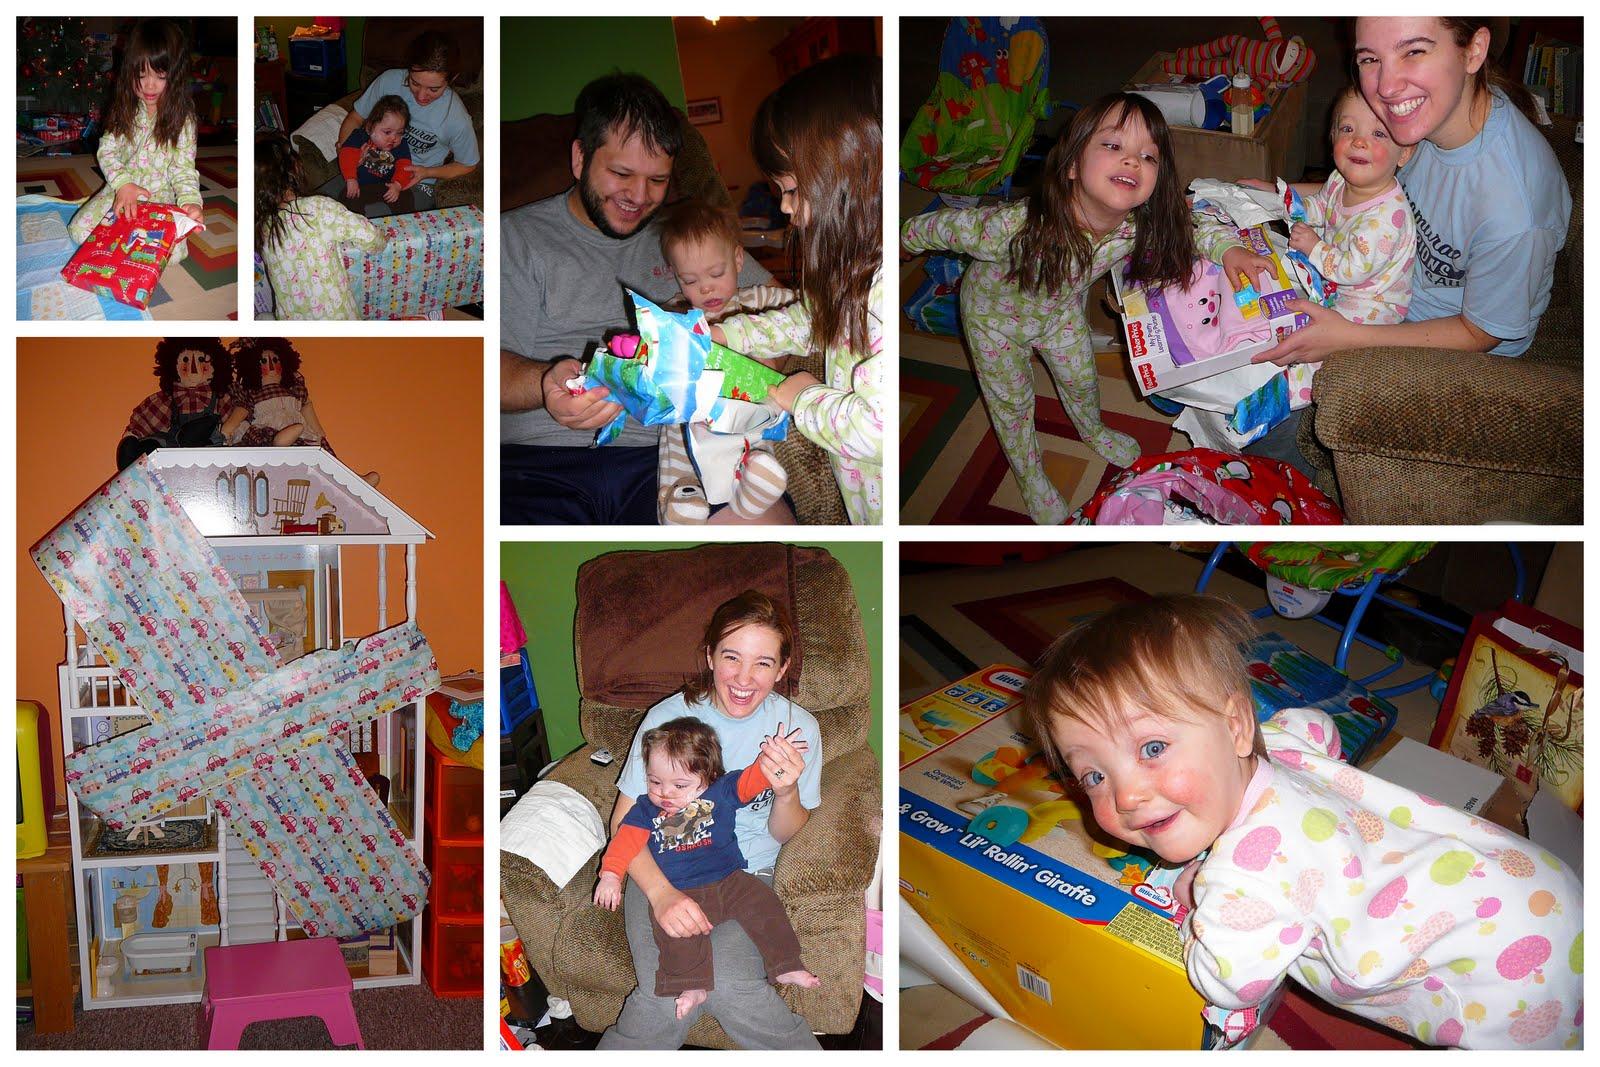 Pollak Family - We\'re Growing!: December 2010